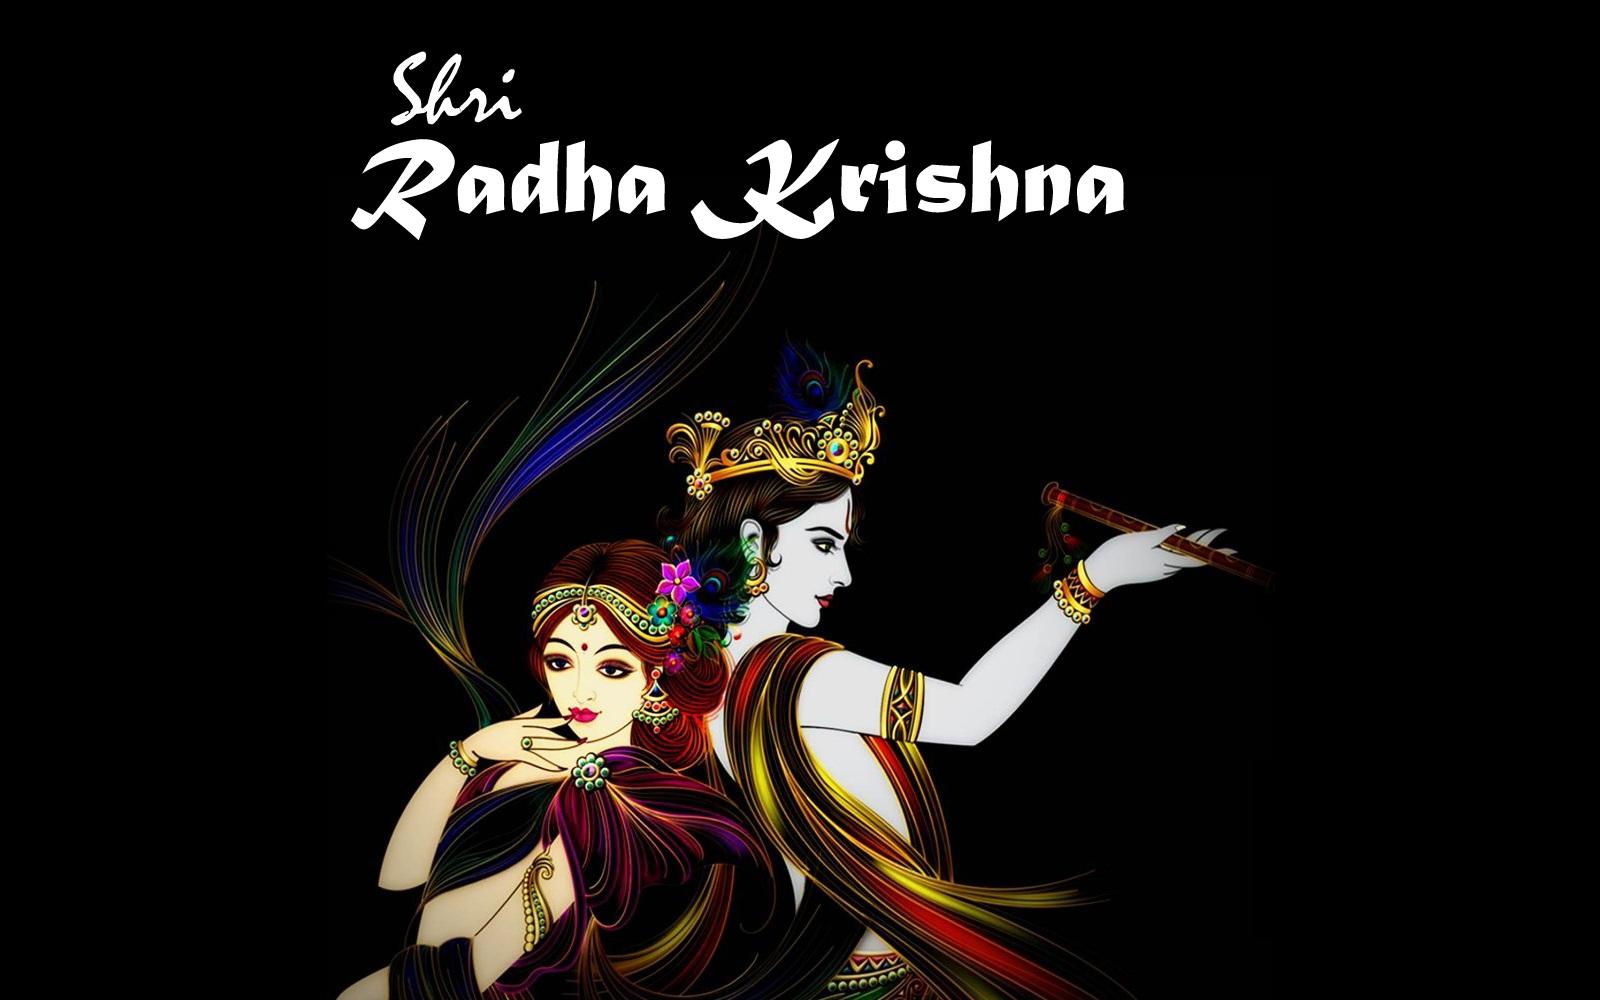 Lord shree bal krishna wallpaper beautiful hd wallpaper - Make Your Desktop Wallpaper More Beautiful And Adorable Lord Krishna Radhe Are Amazingly Love Bonds Hd Wallpapers Images Graphics